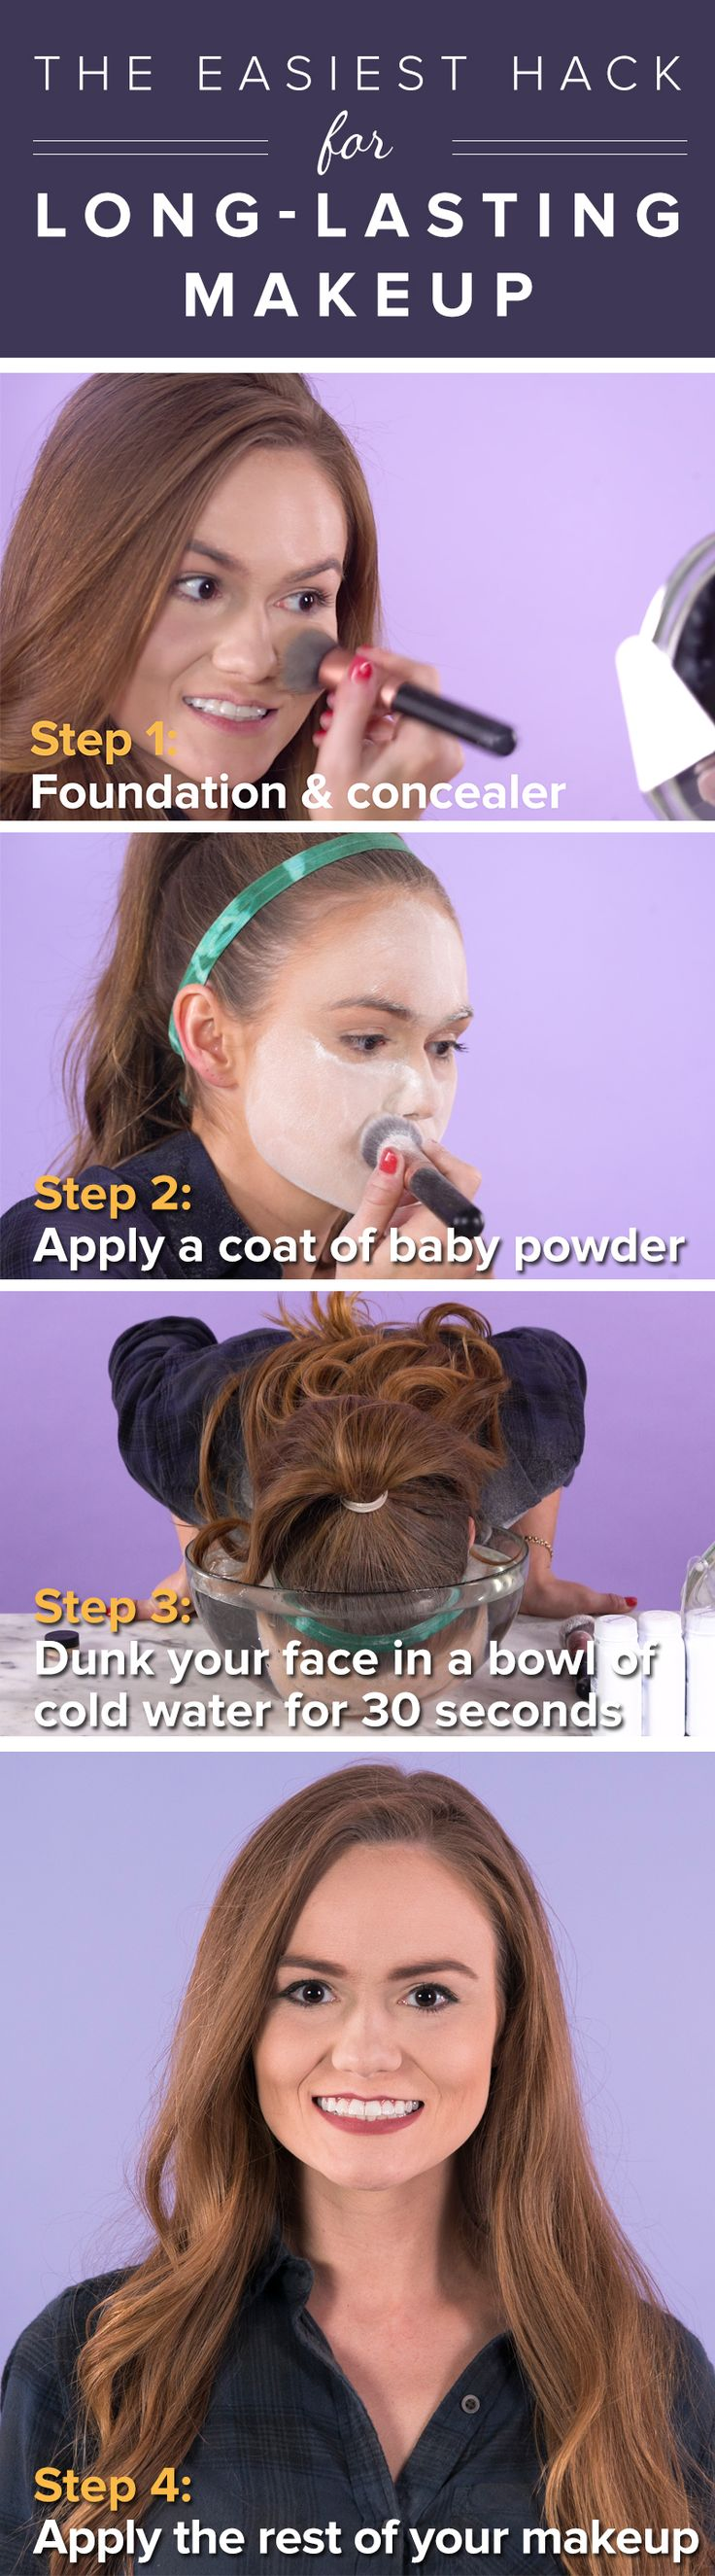 25+ best Long lasting makeup ideas on Pinterest | Makeup primer ...